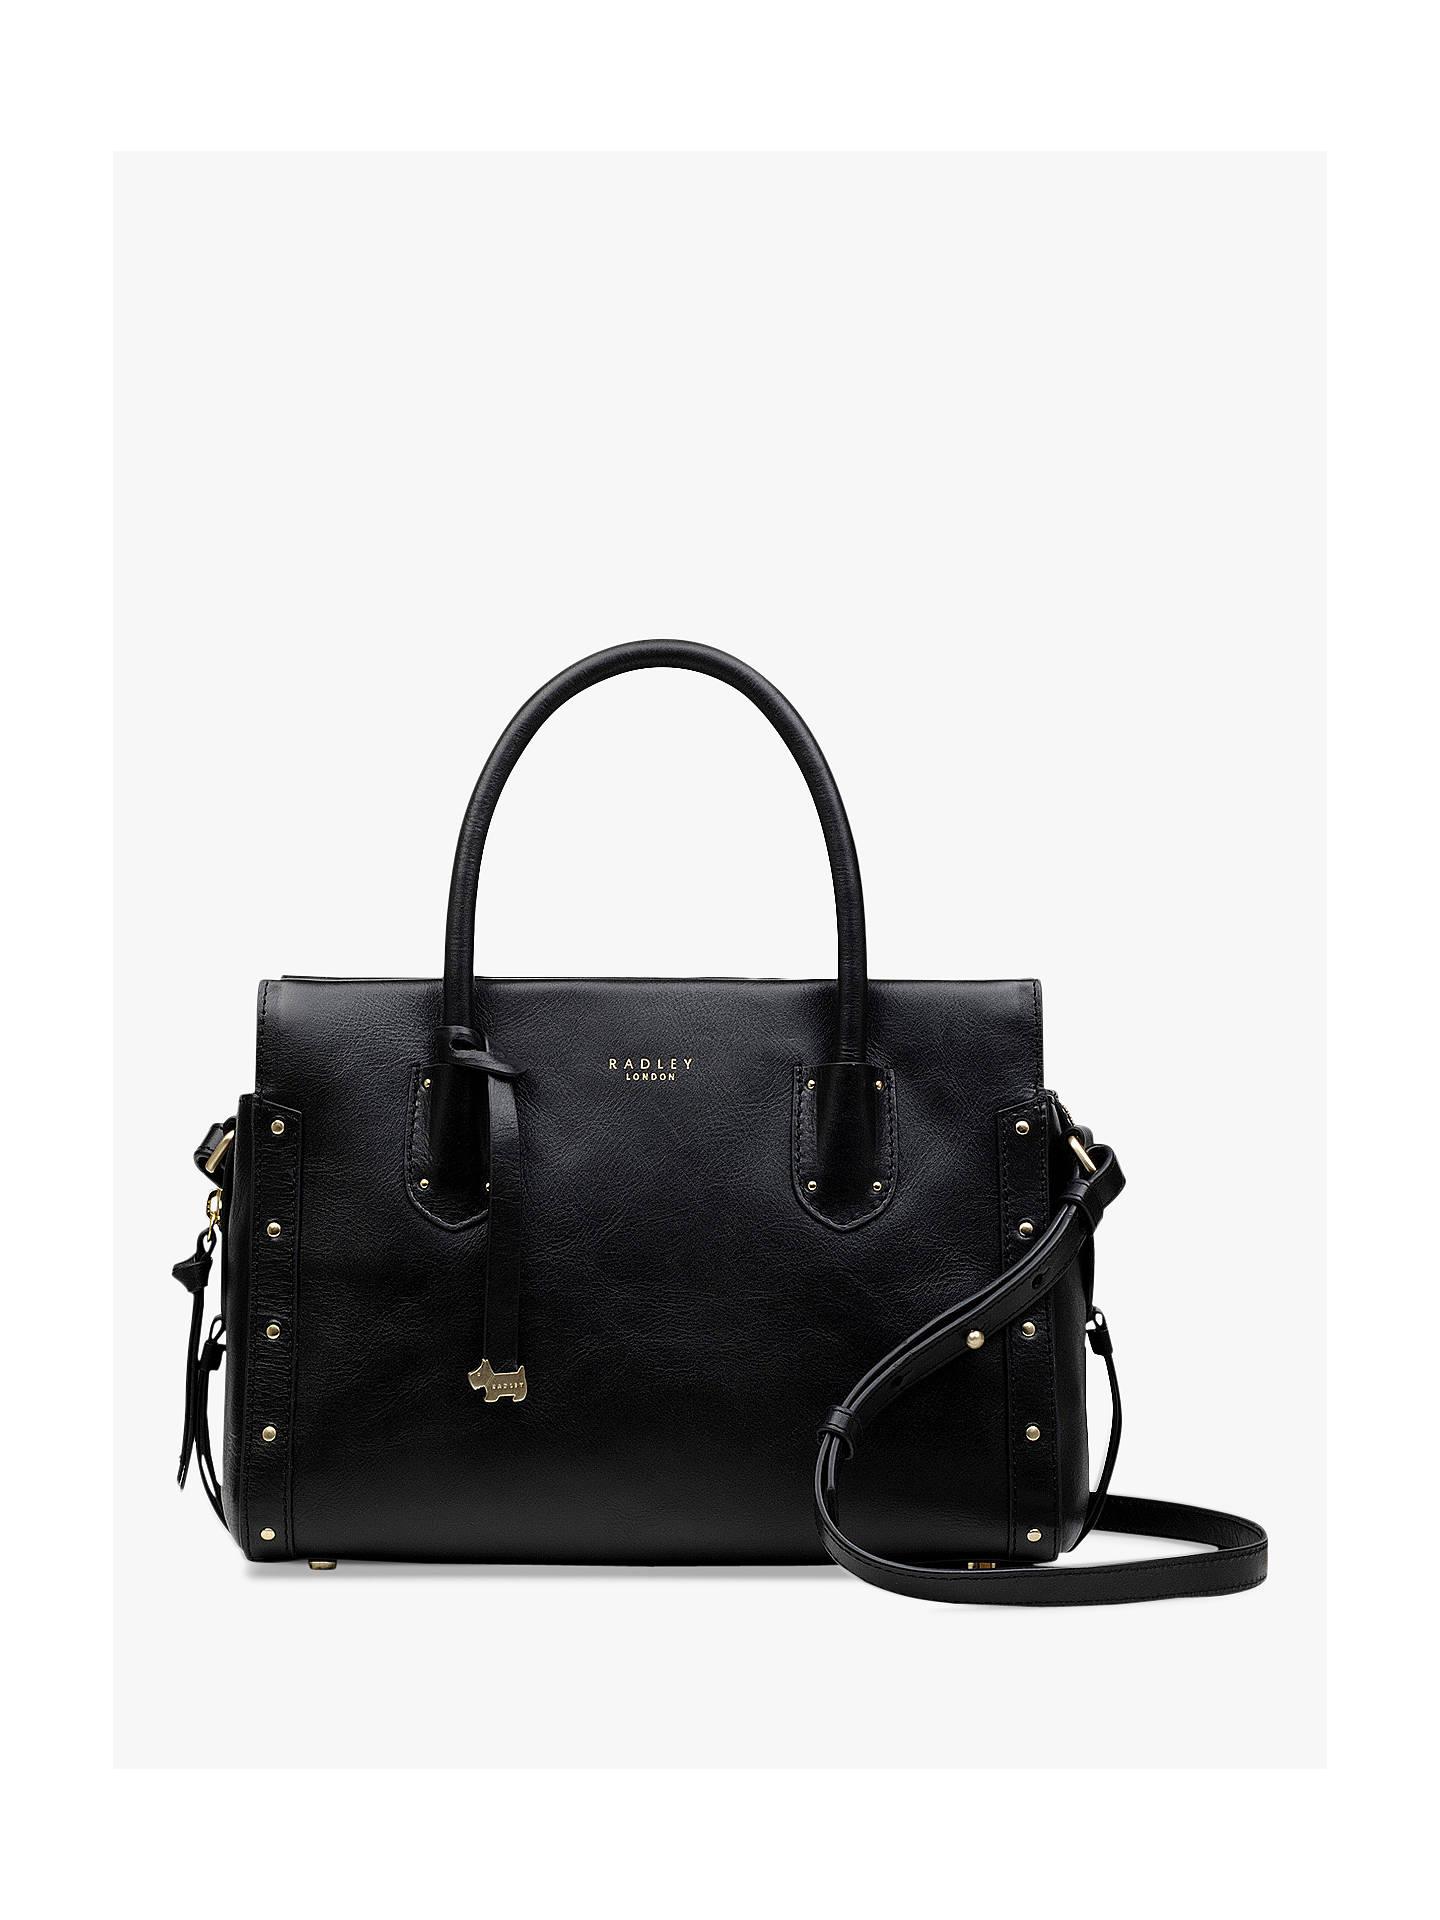 6452f7466517 BuyRadley Kelham Hall Leather Multiway Tote Bag